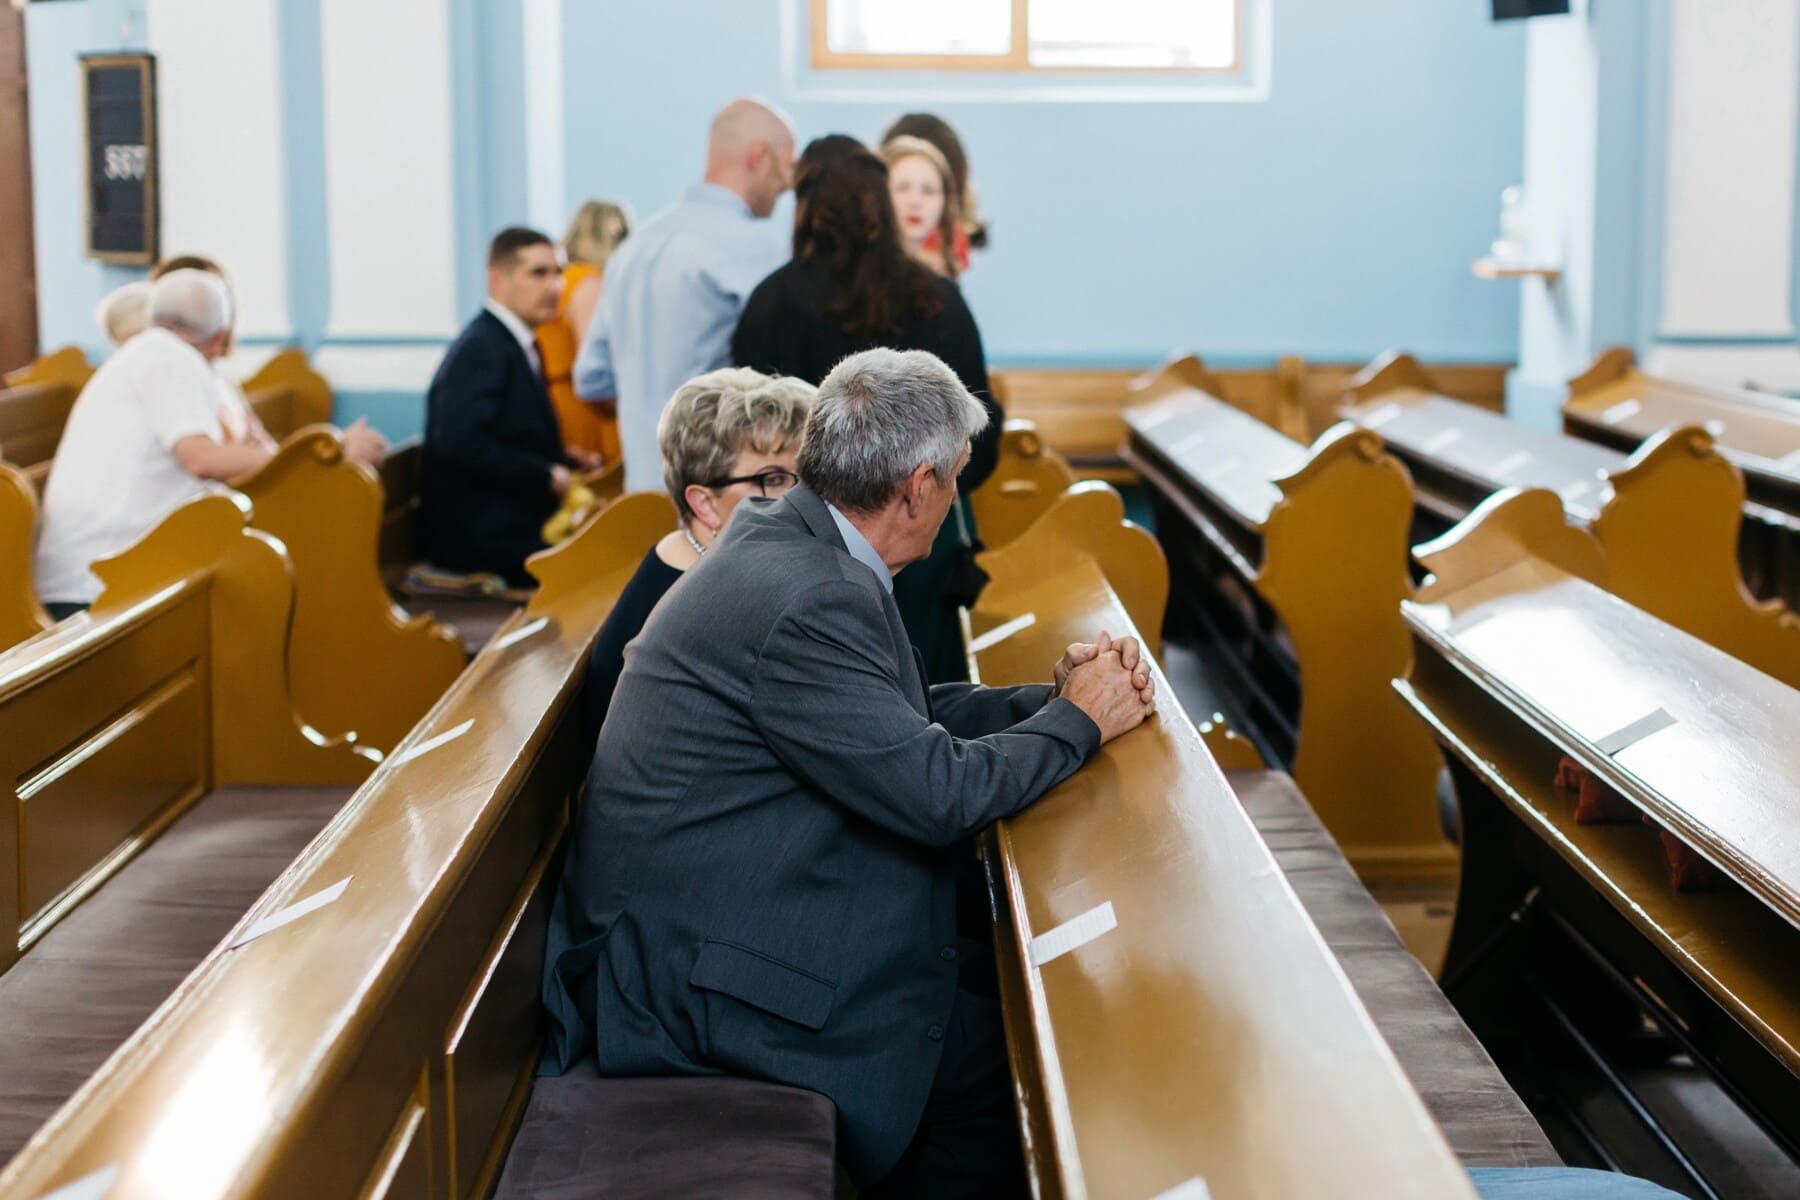 prayer, catholic, church, man, interior, religion, christianity, businessman, business, meeting